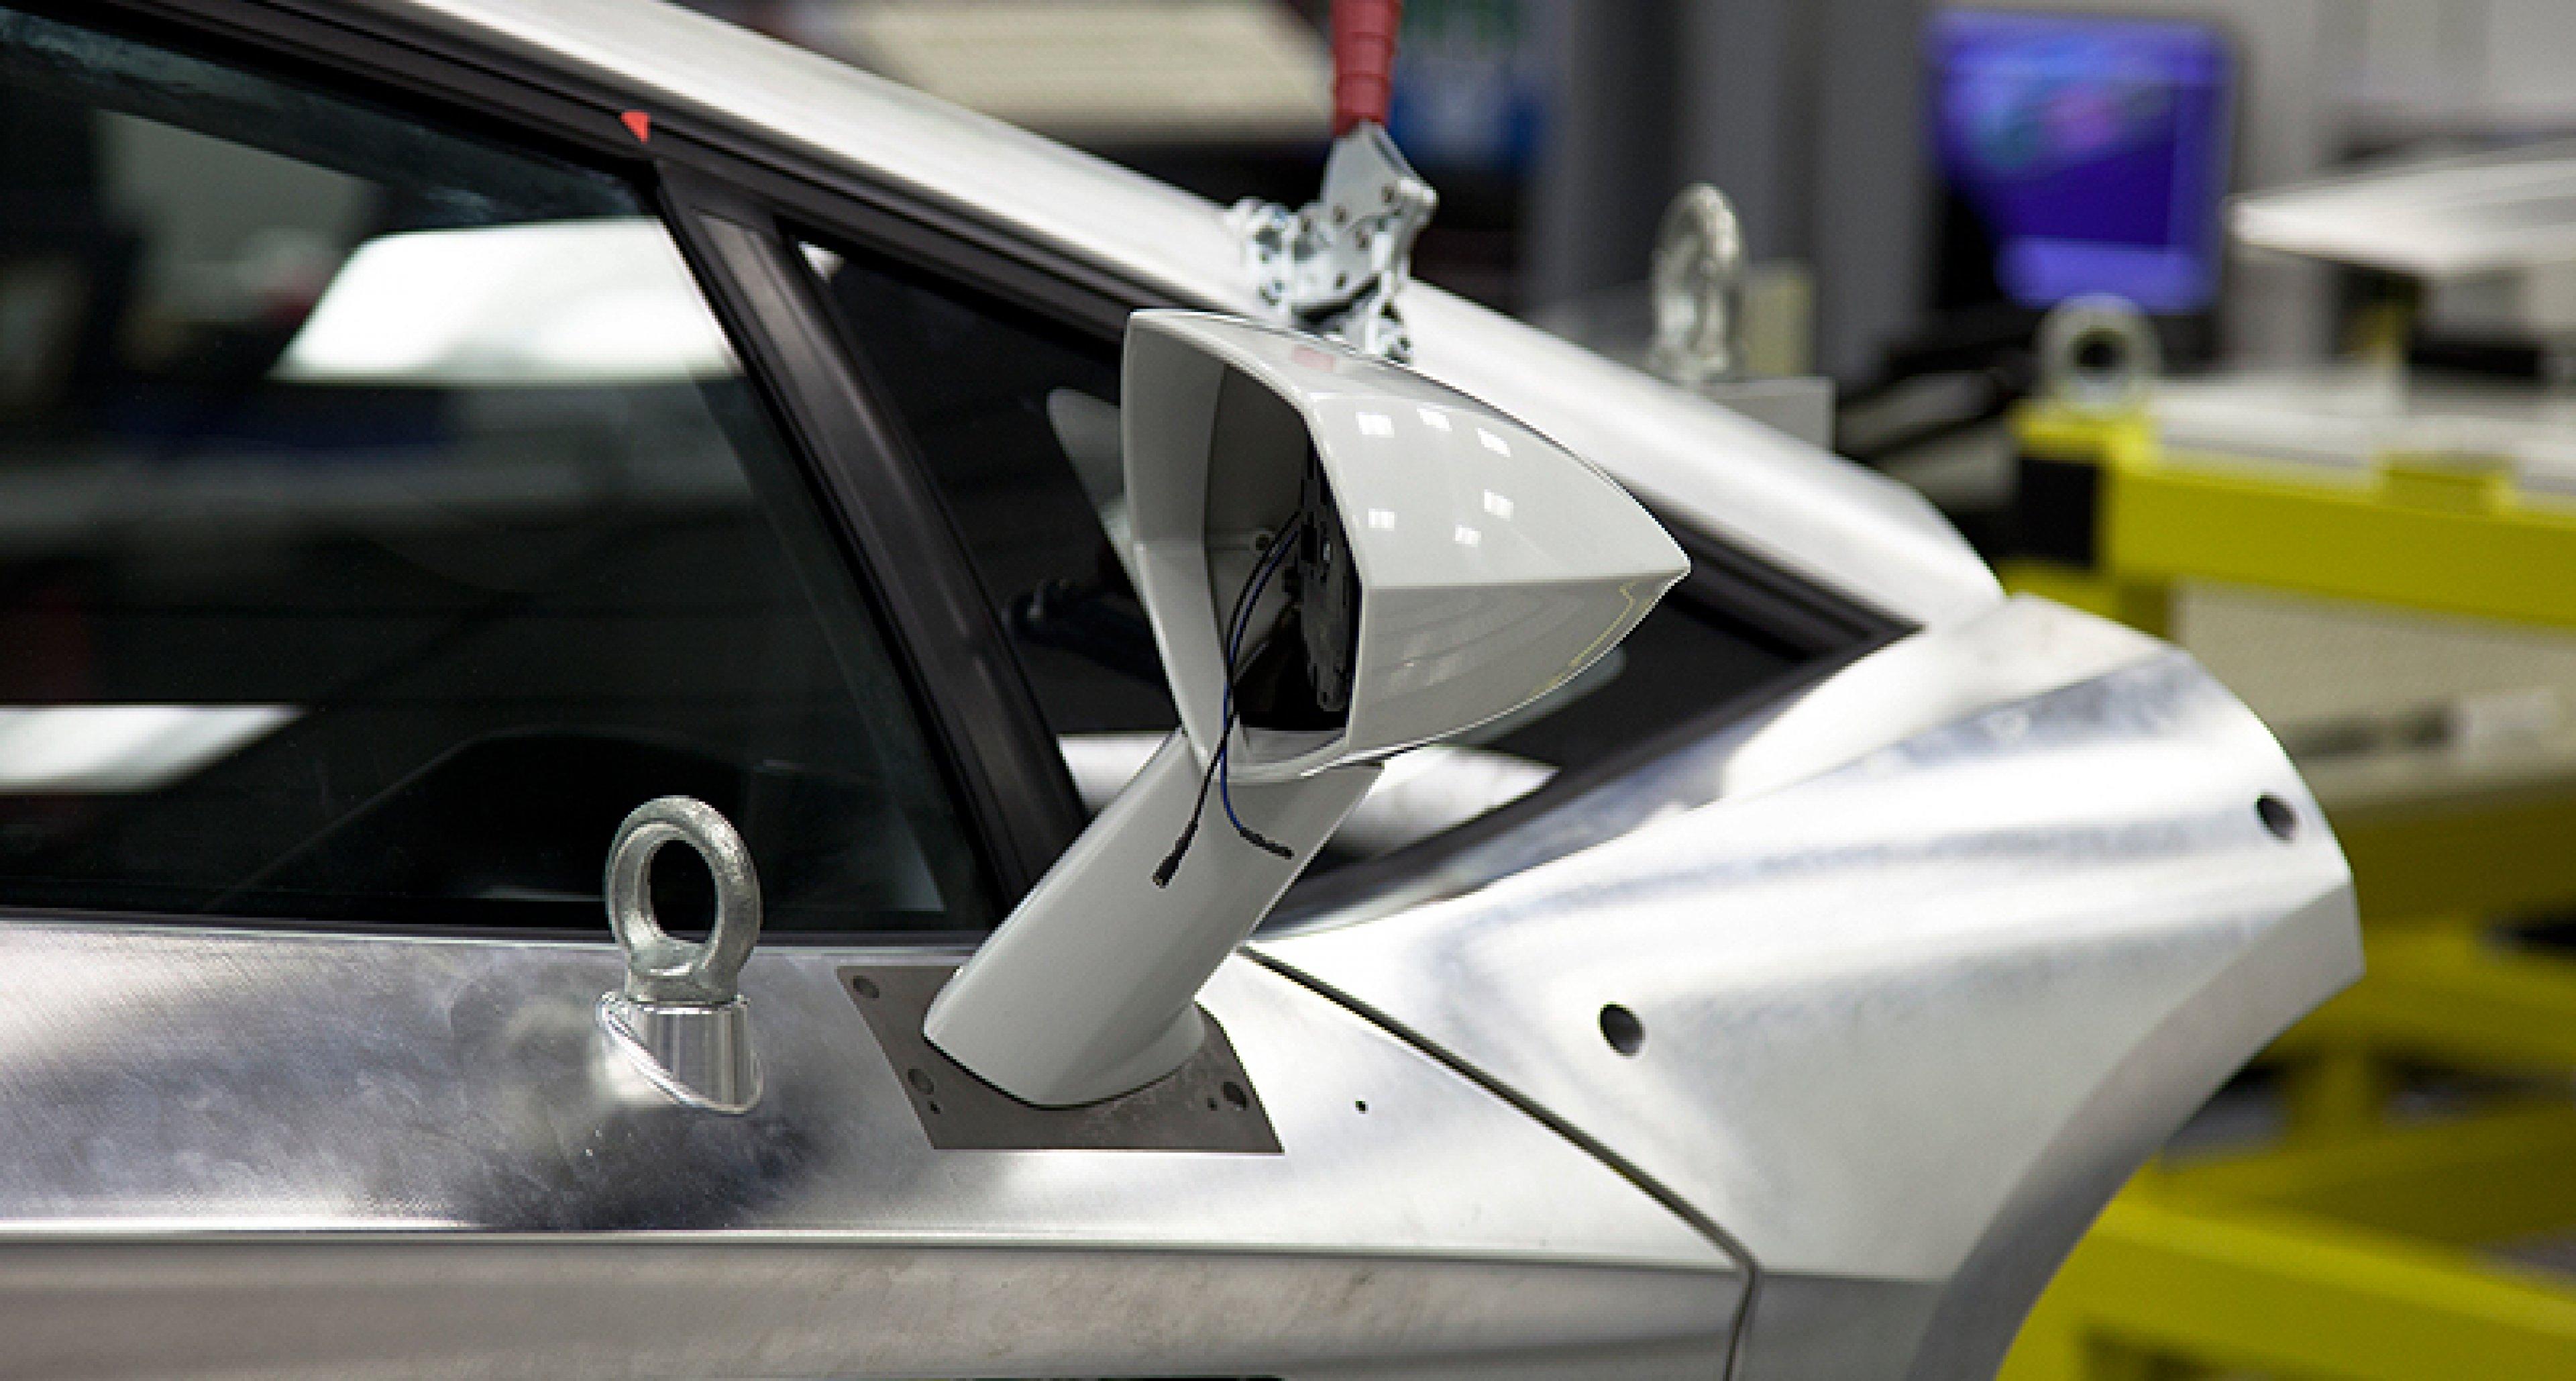 Qualitätsmanagement bei Lamborghini: Die Ordnung der Dinge